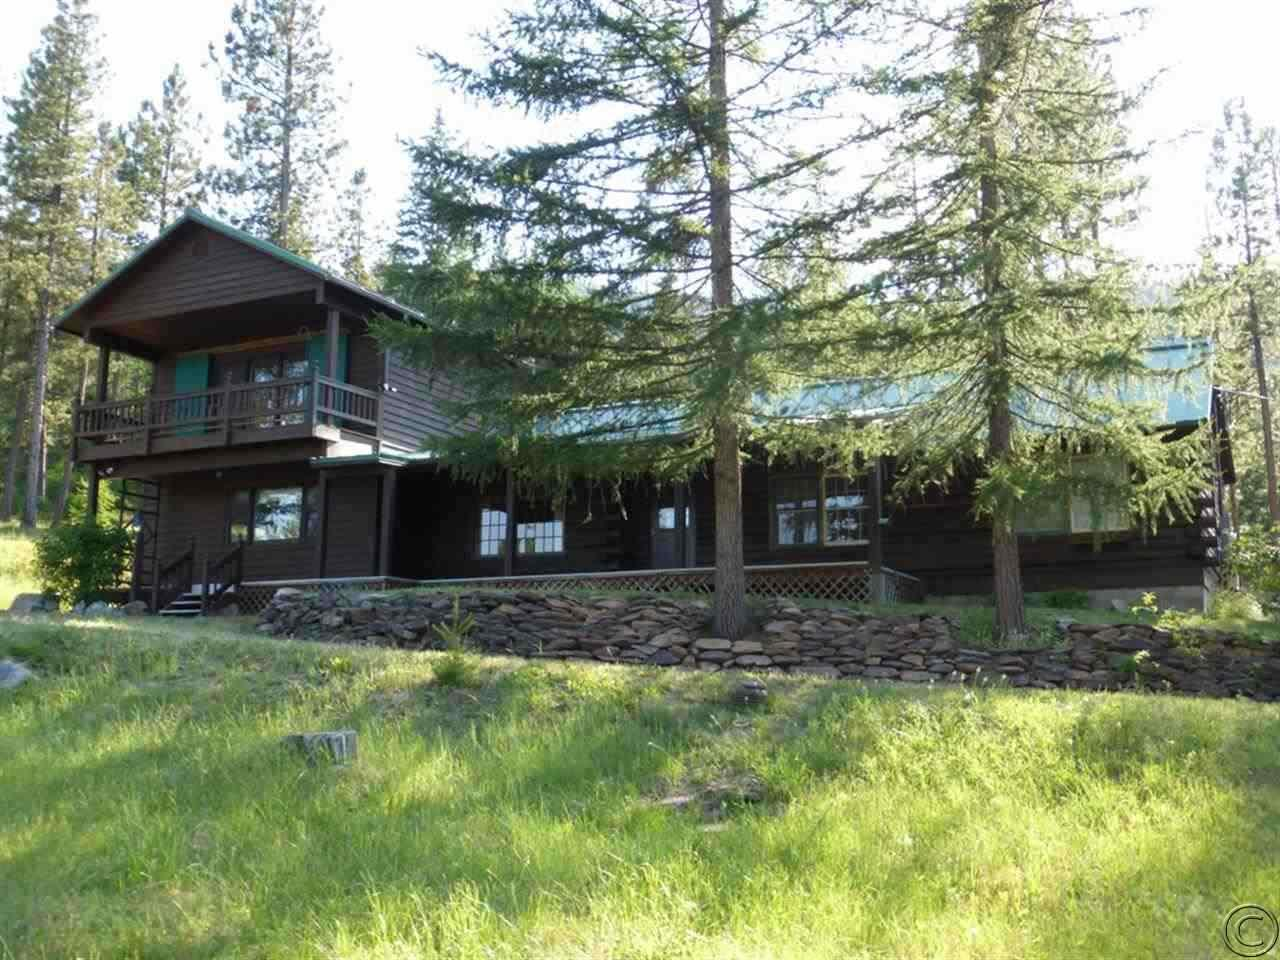 Real Estate for Sale, ListingId: 32642576, Arlee,MT59821